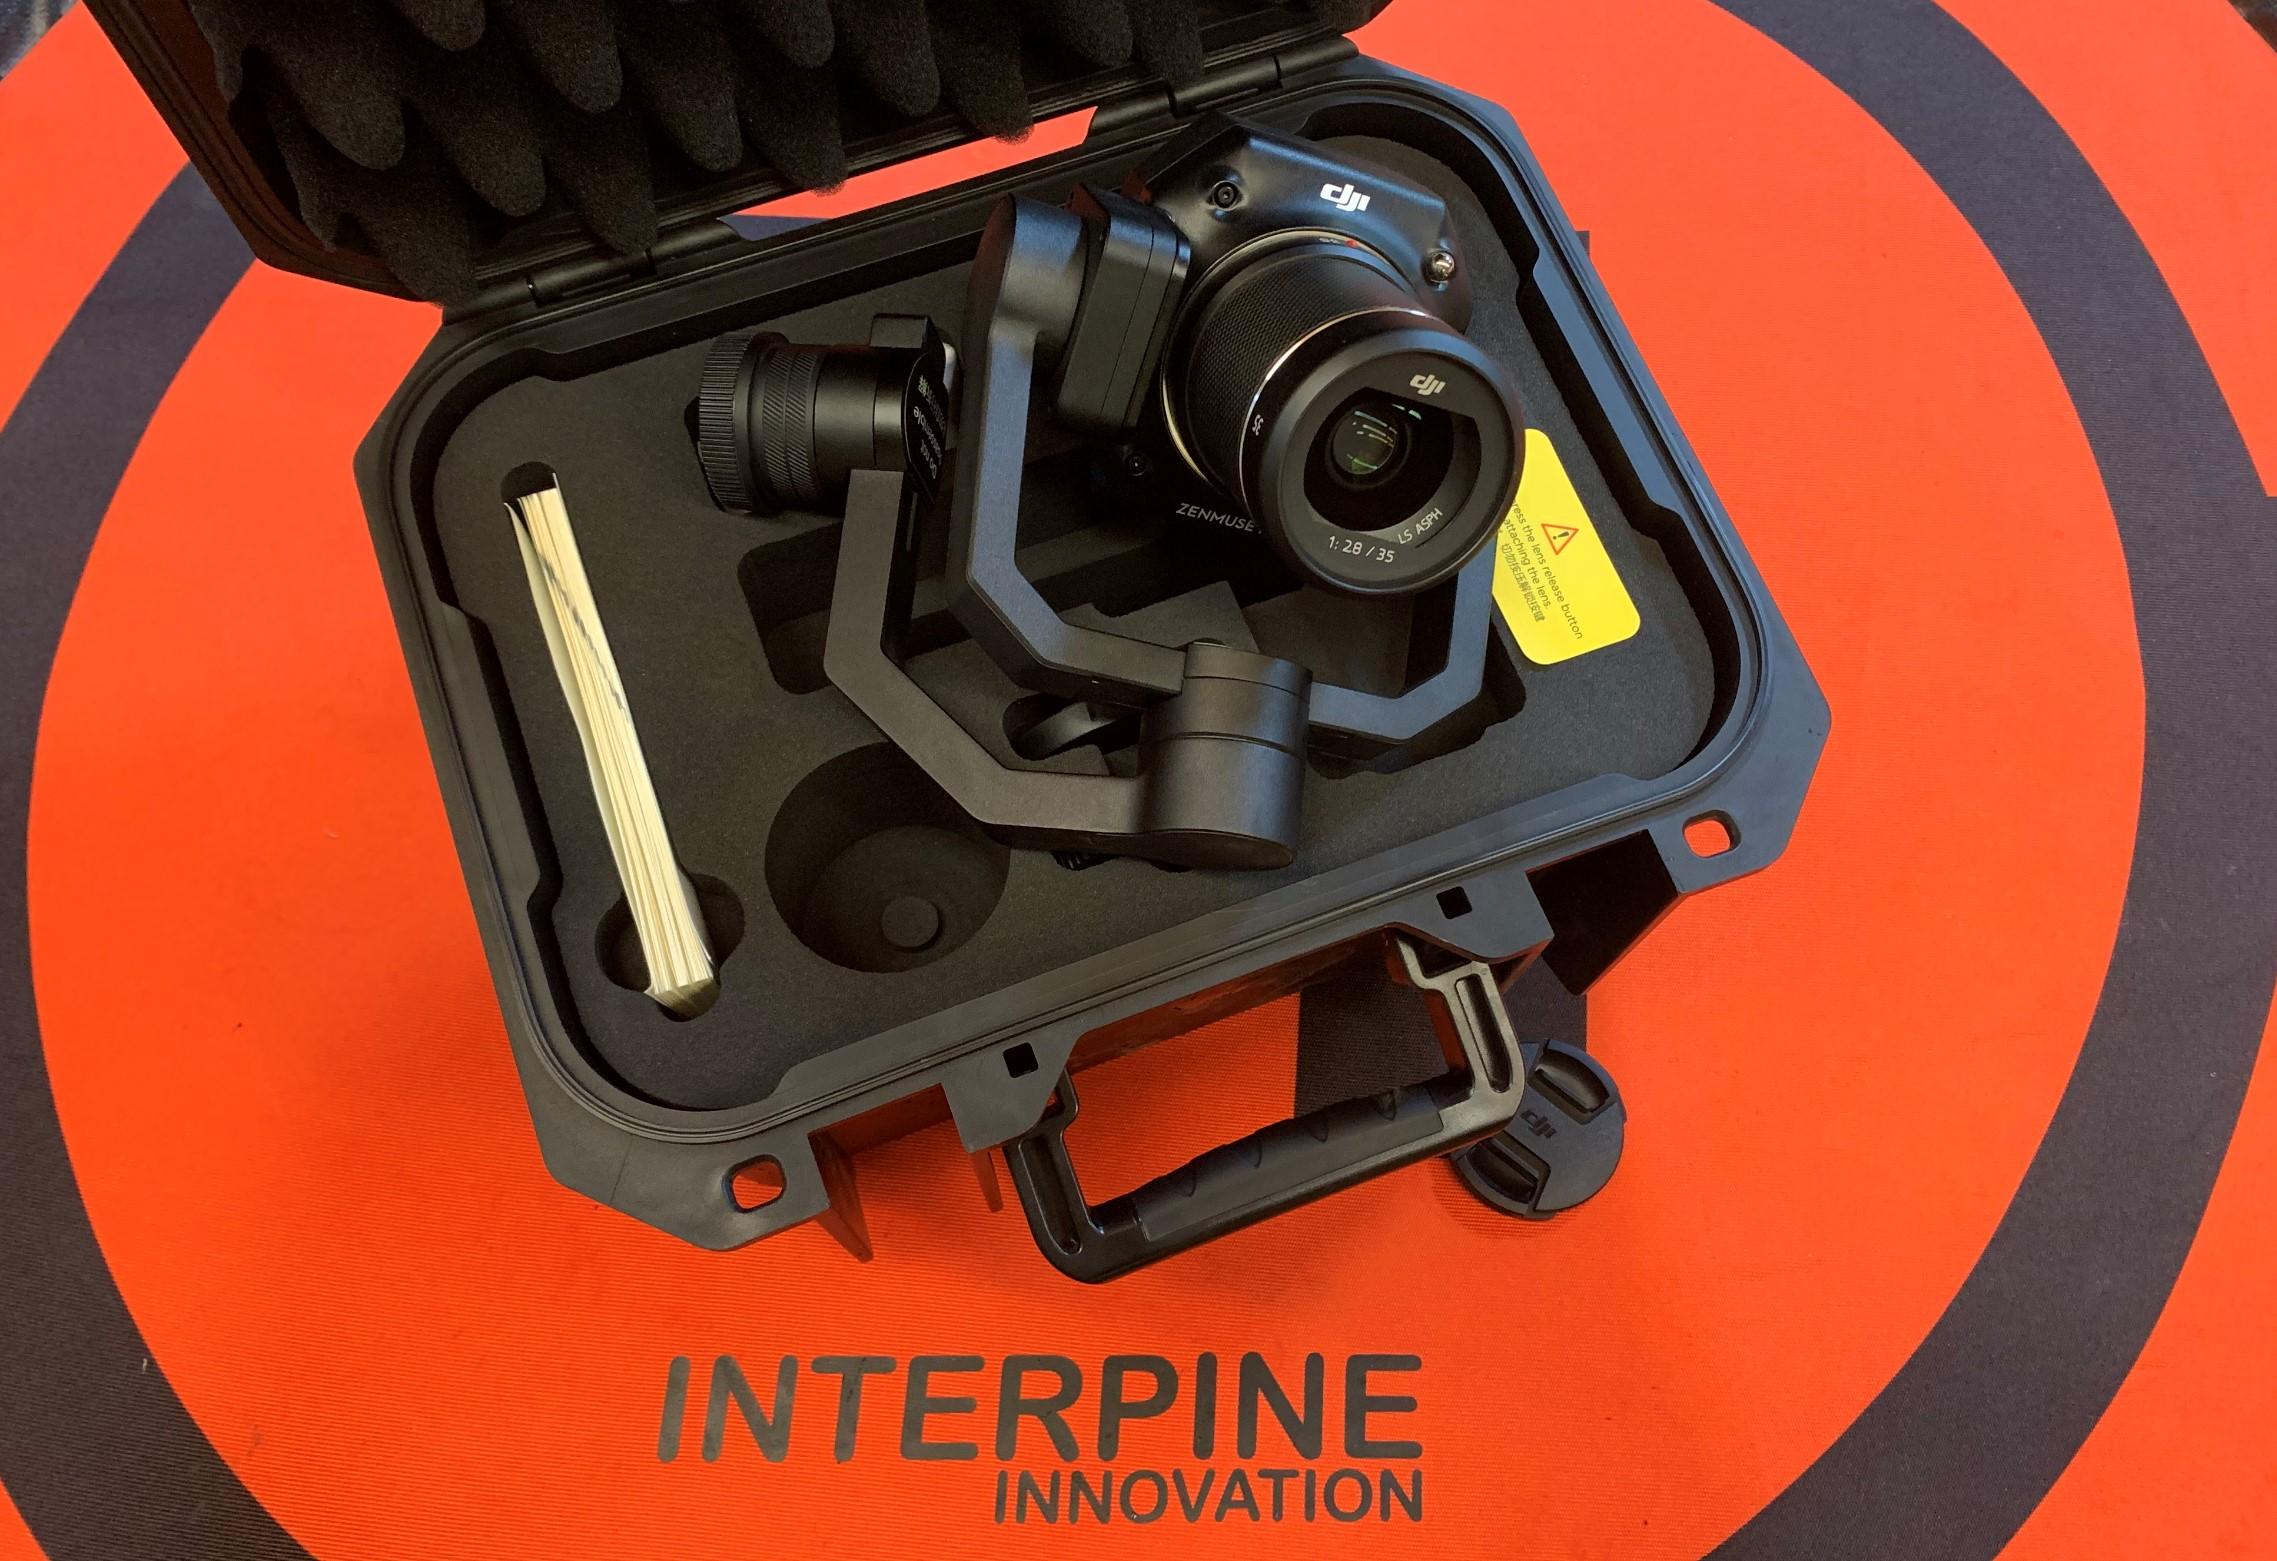 Interpine DJI Zenmuse P1